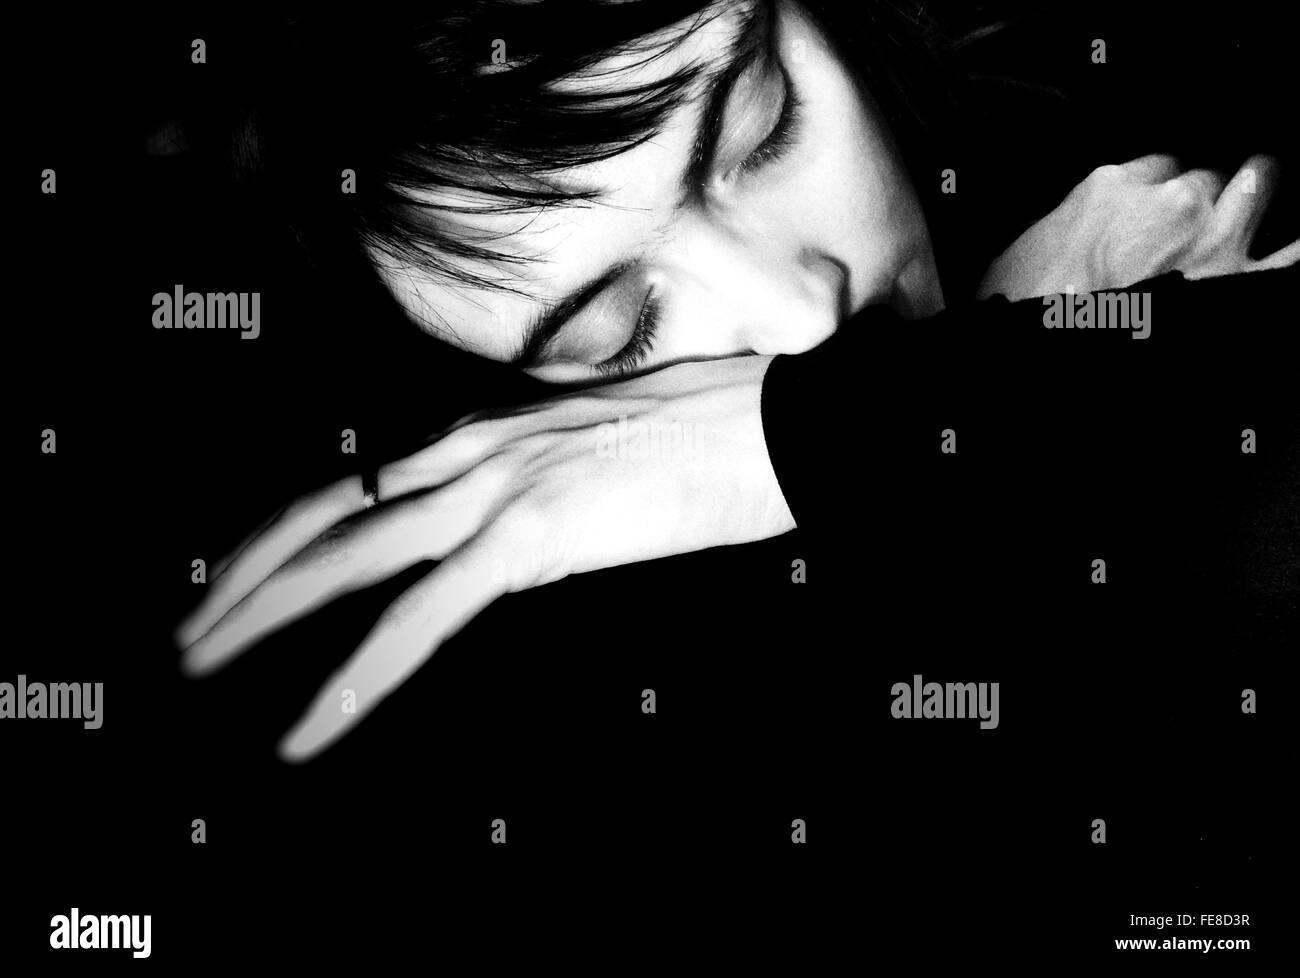 Porträt der Frau schläft Stockbild